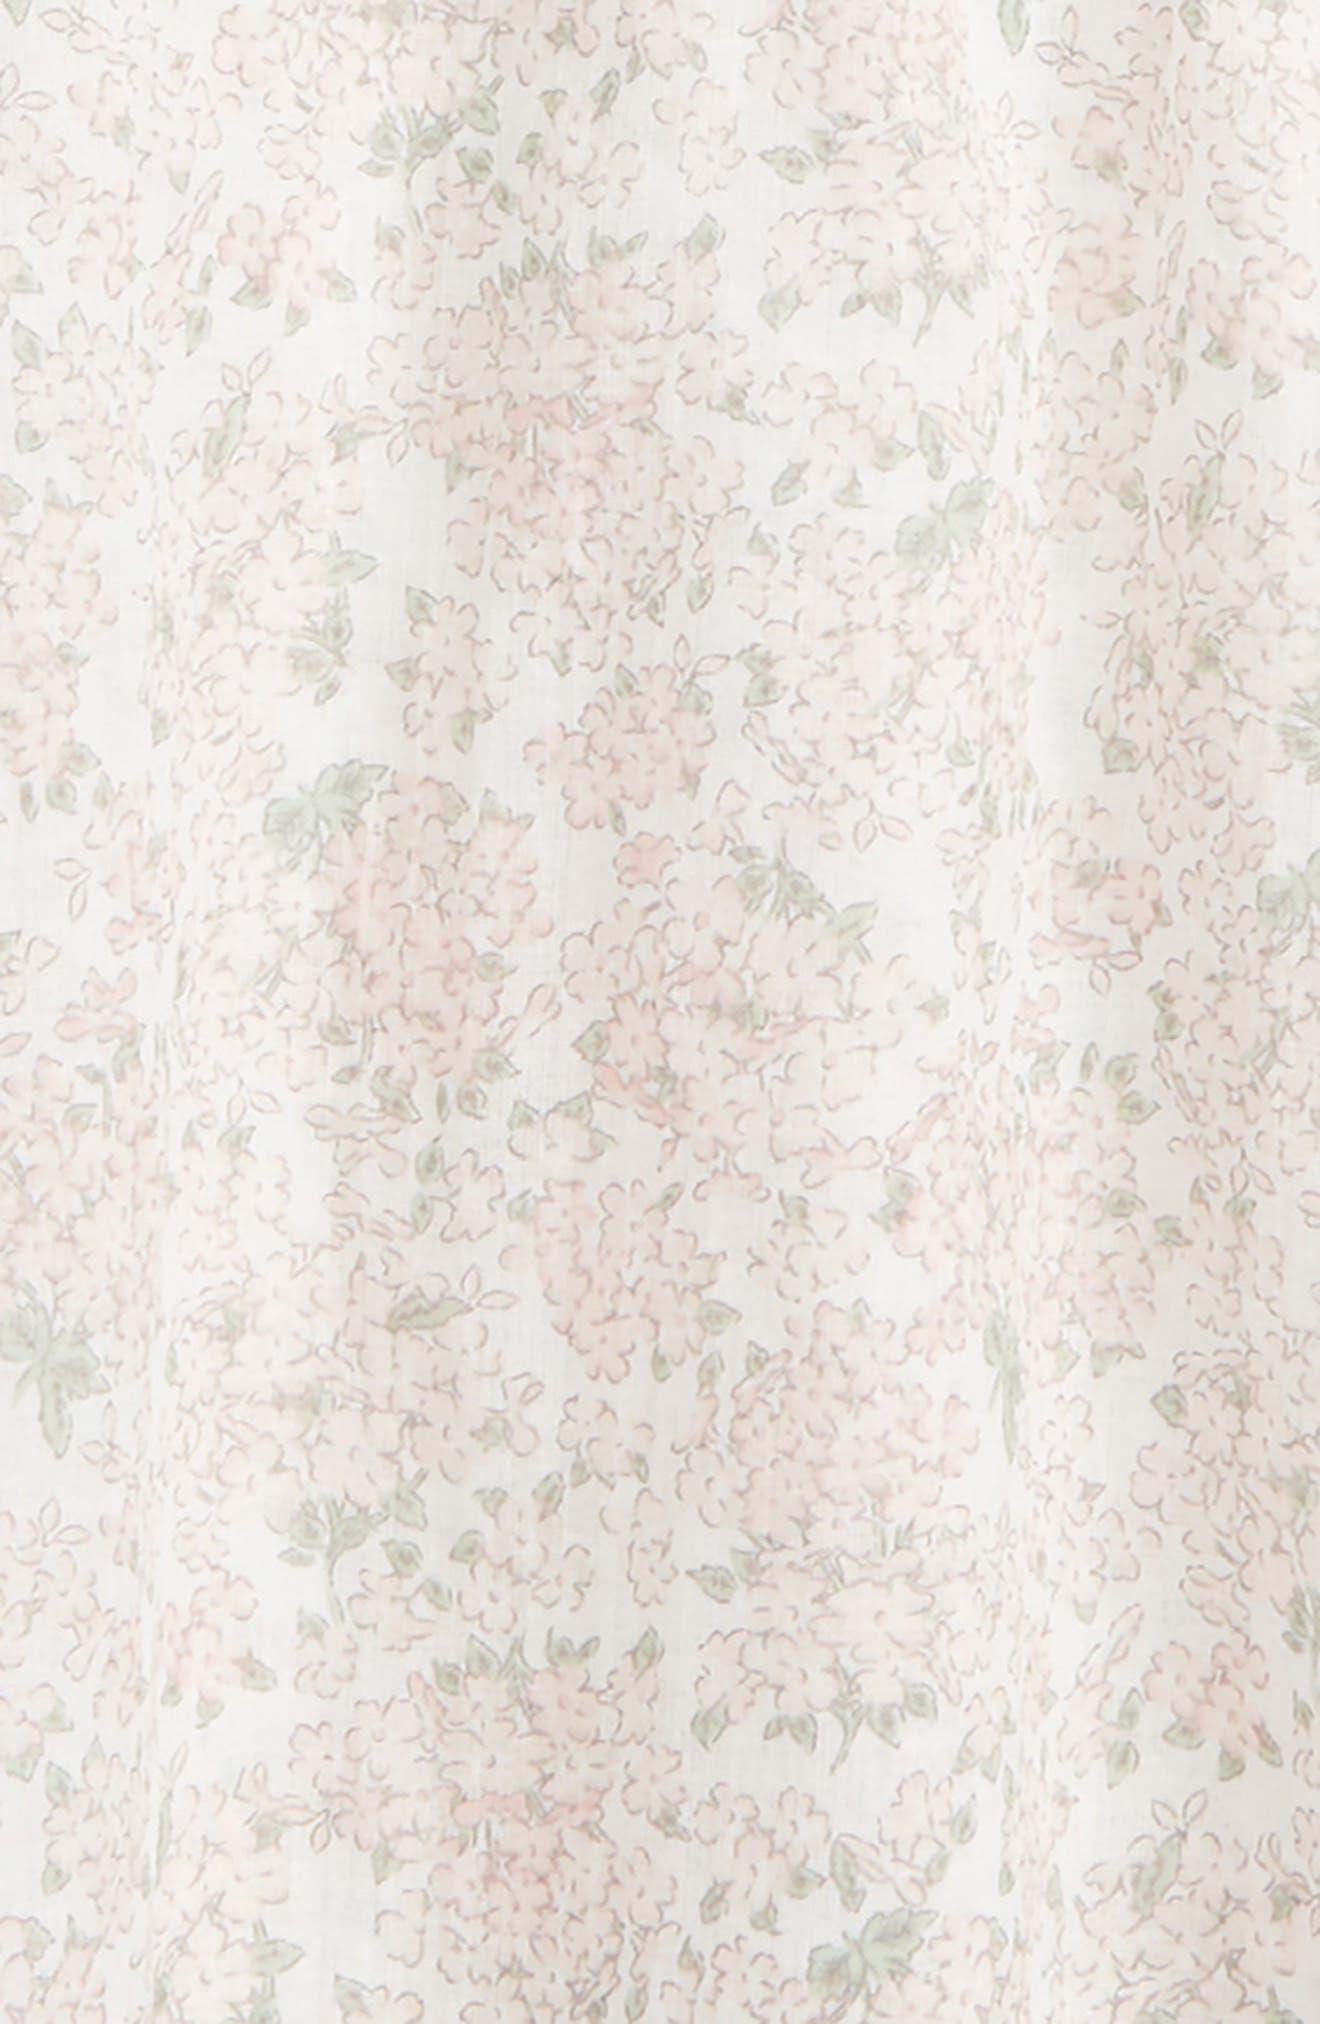 Felia Floral Print Blouse,                             Alternate thumbnail 2, color,                             Ivory